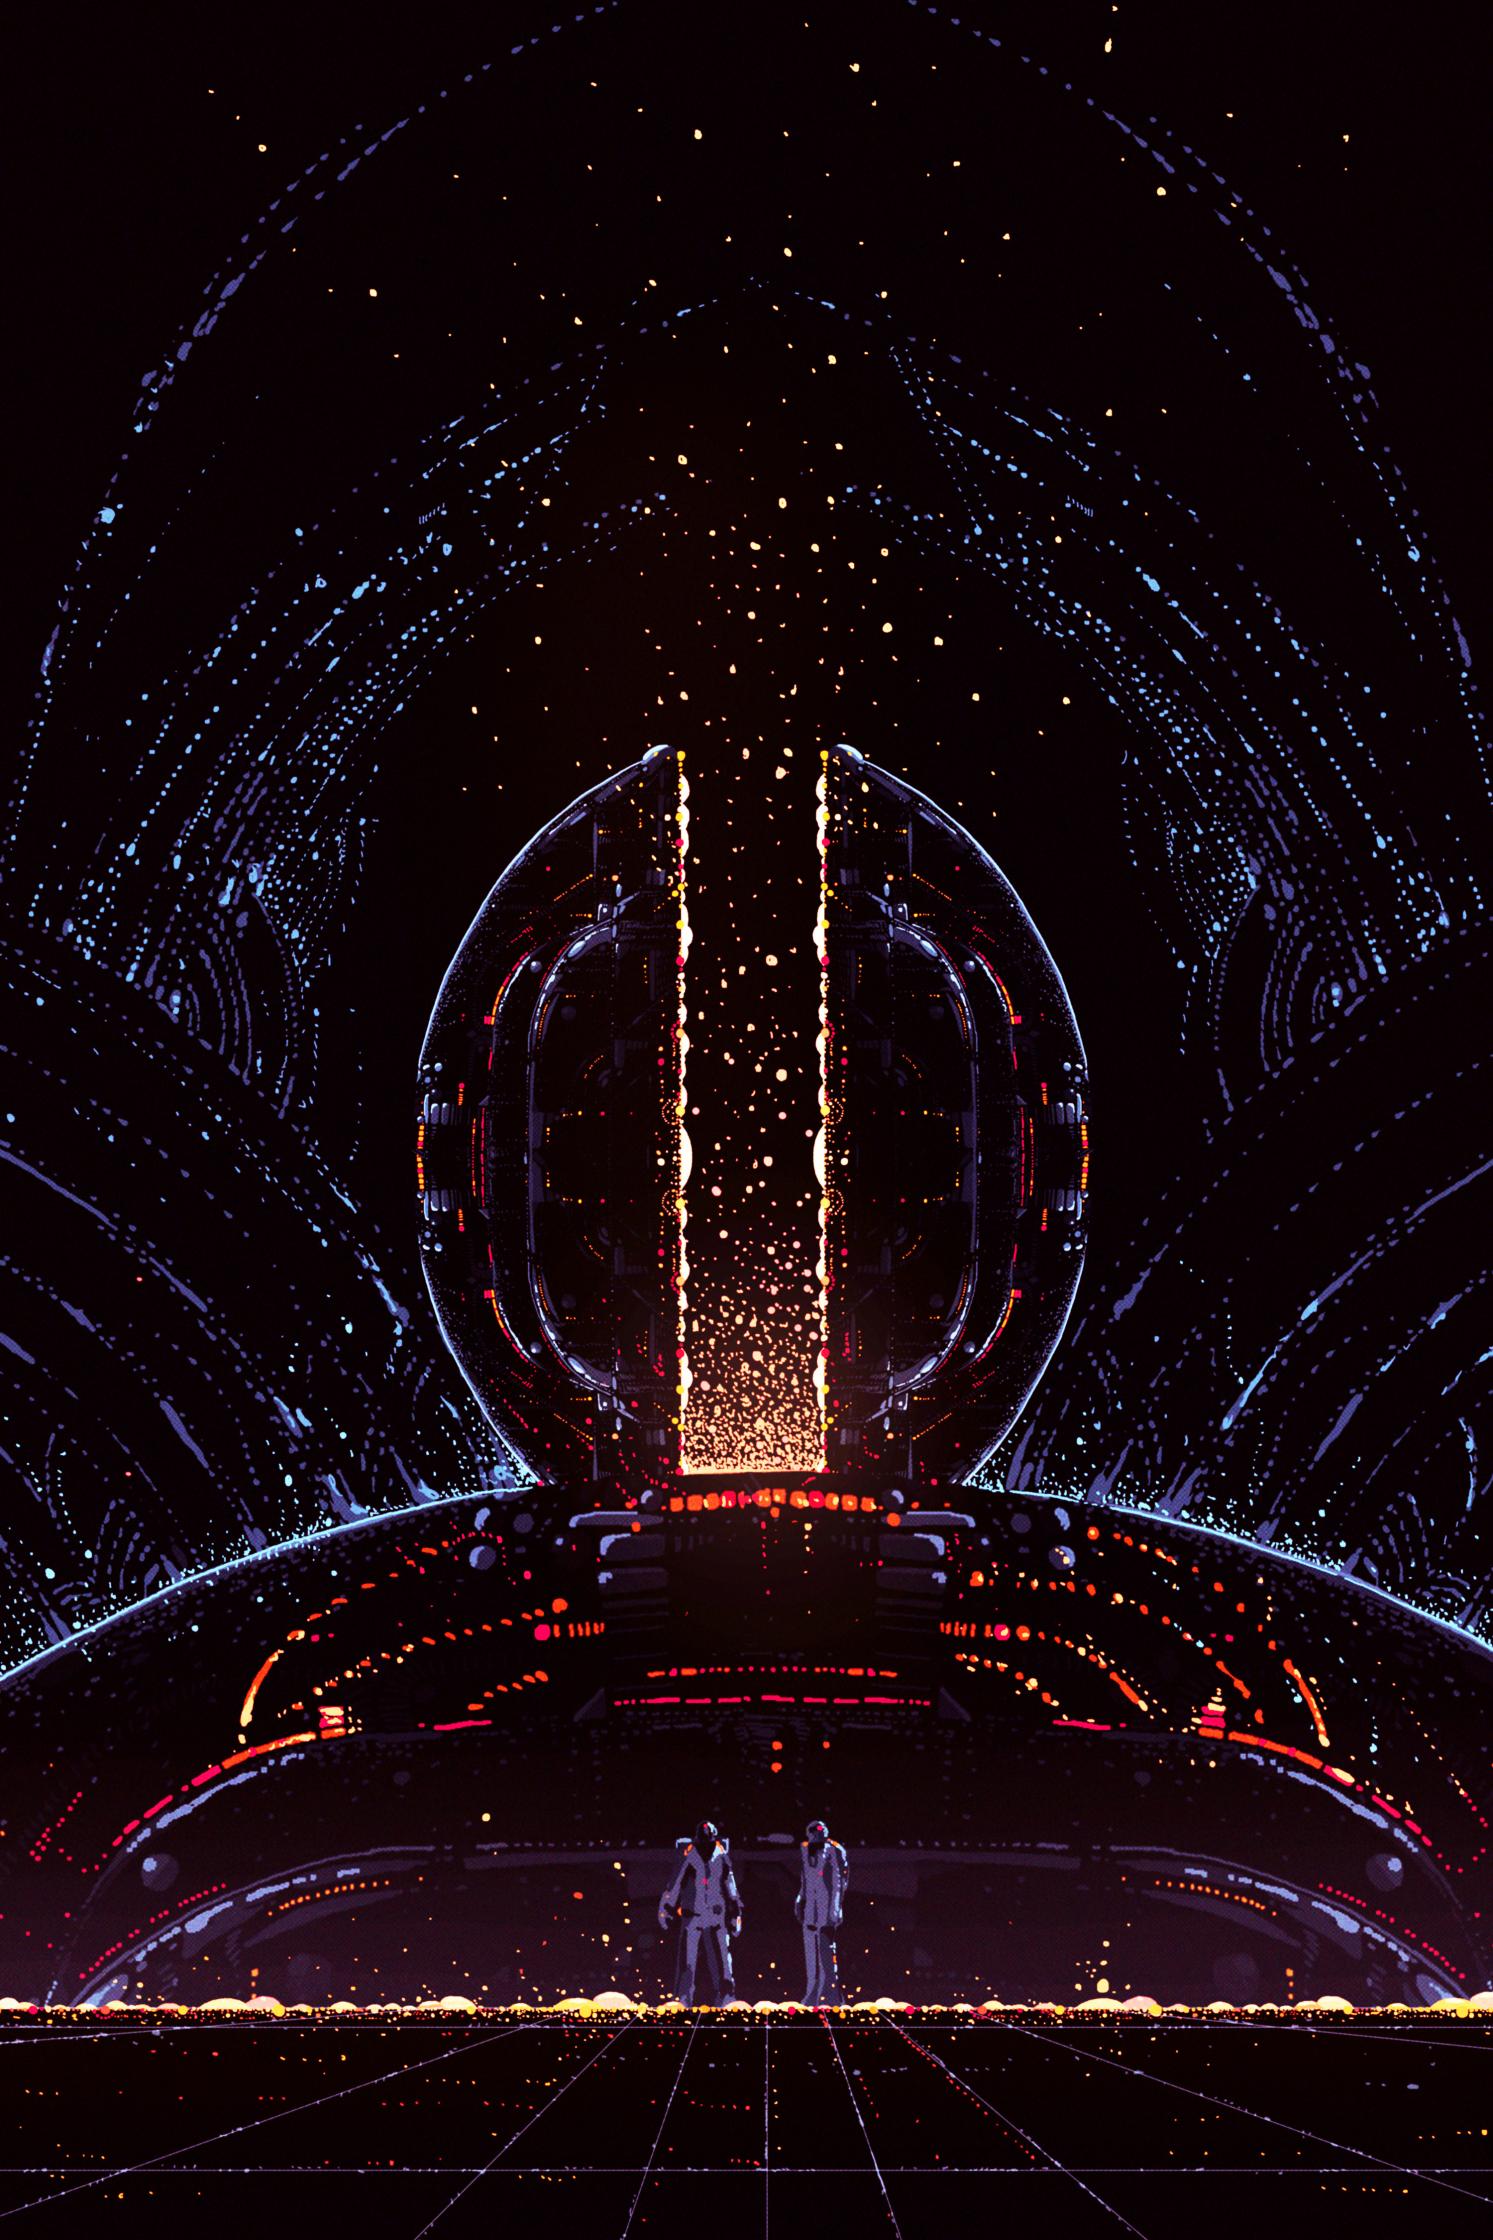 Space Gate